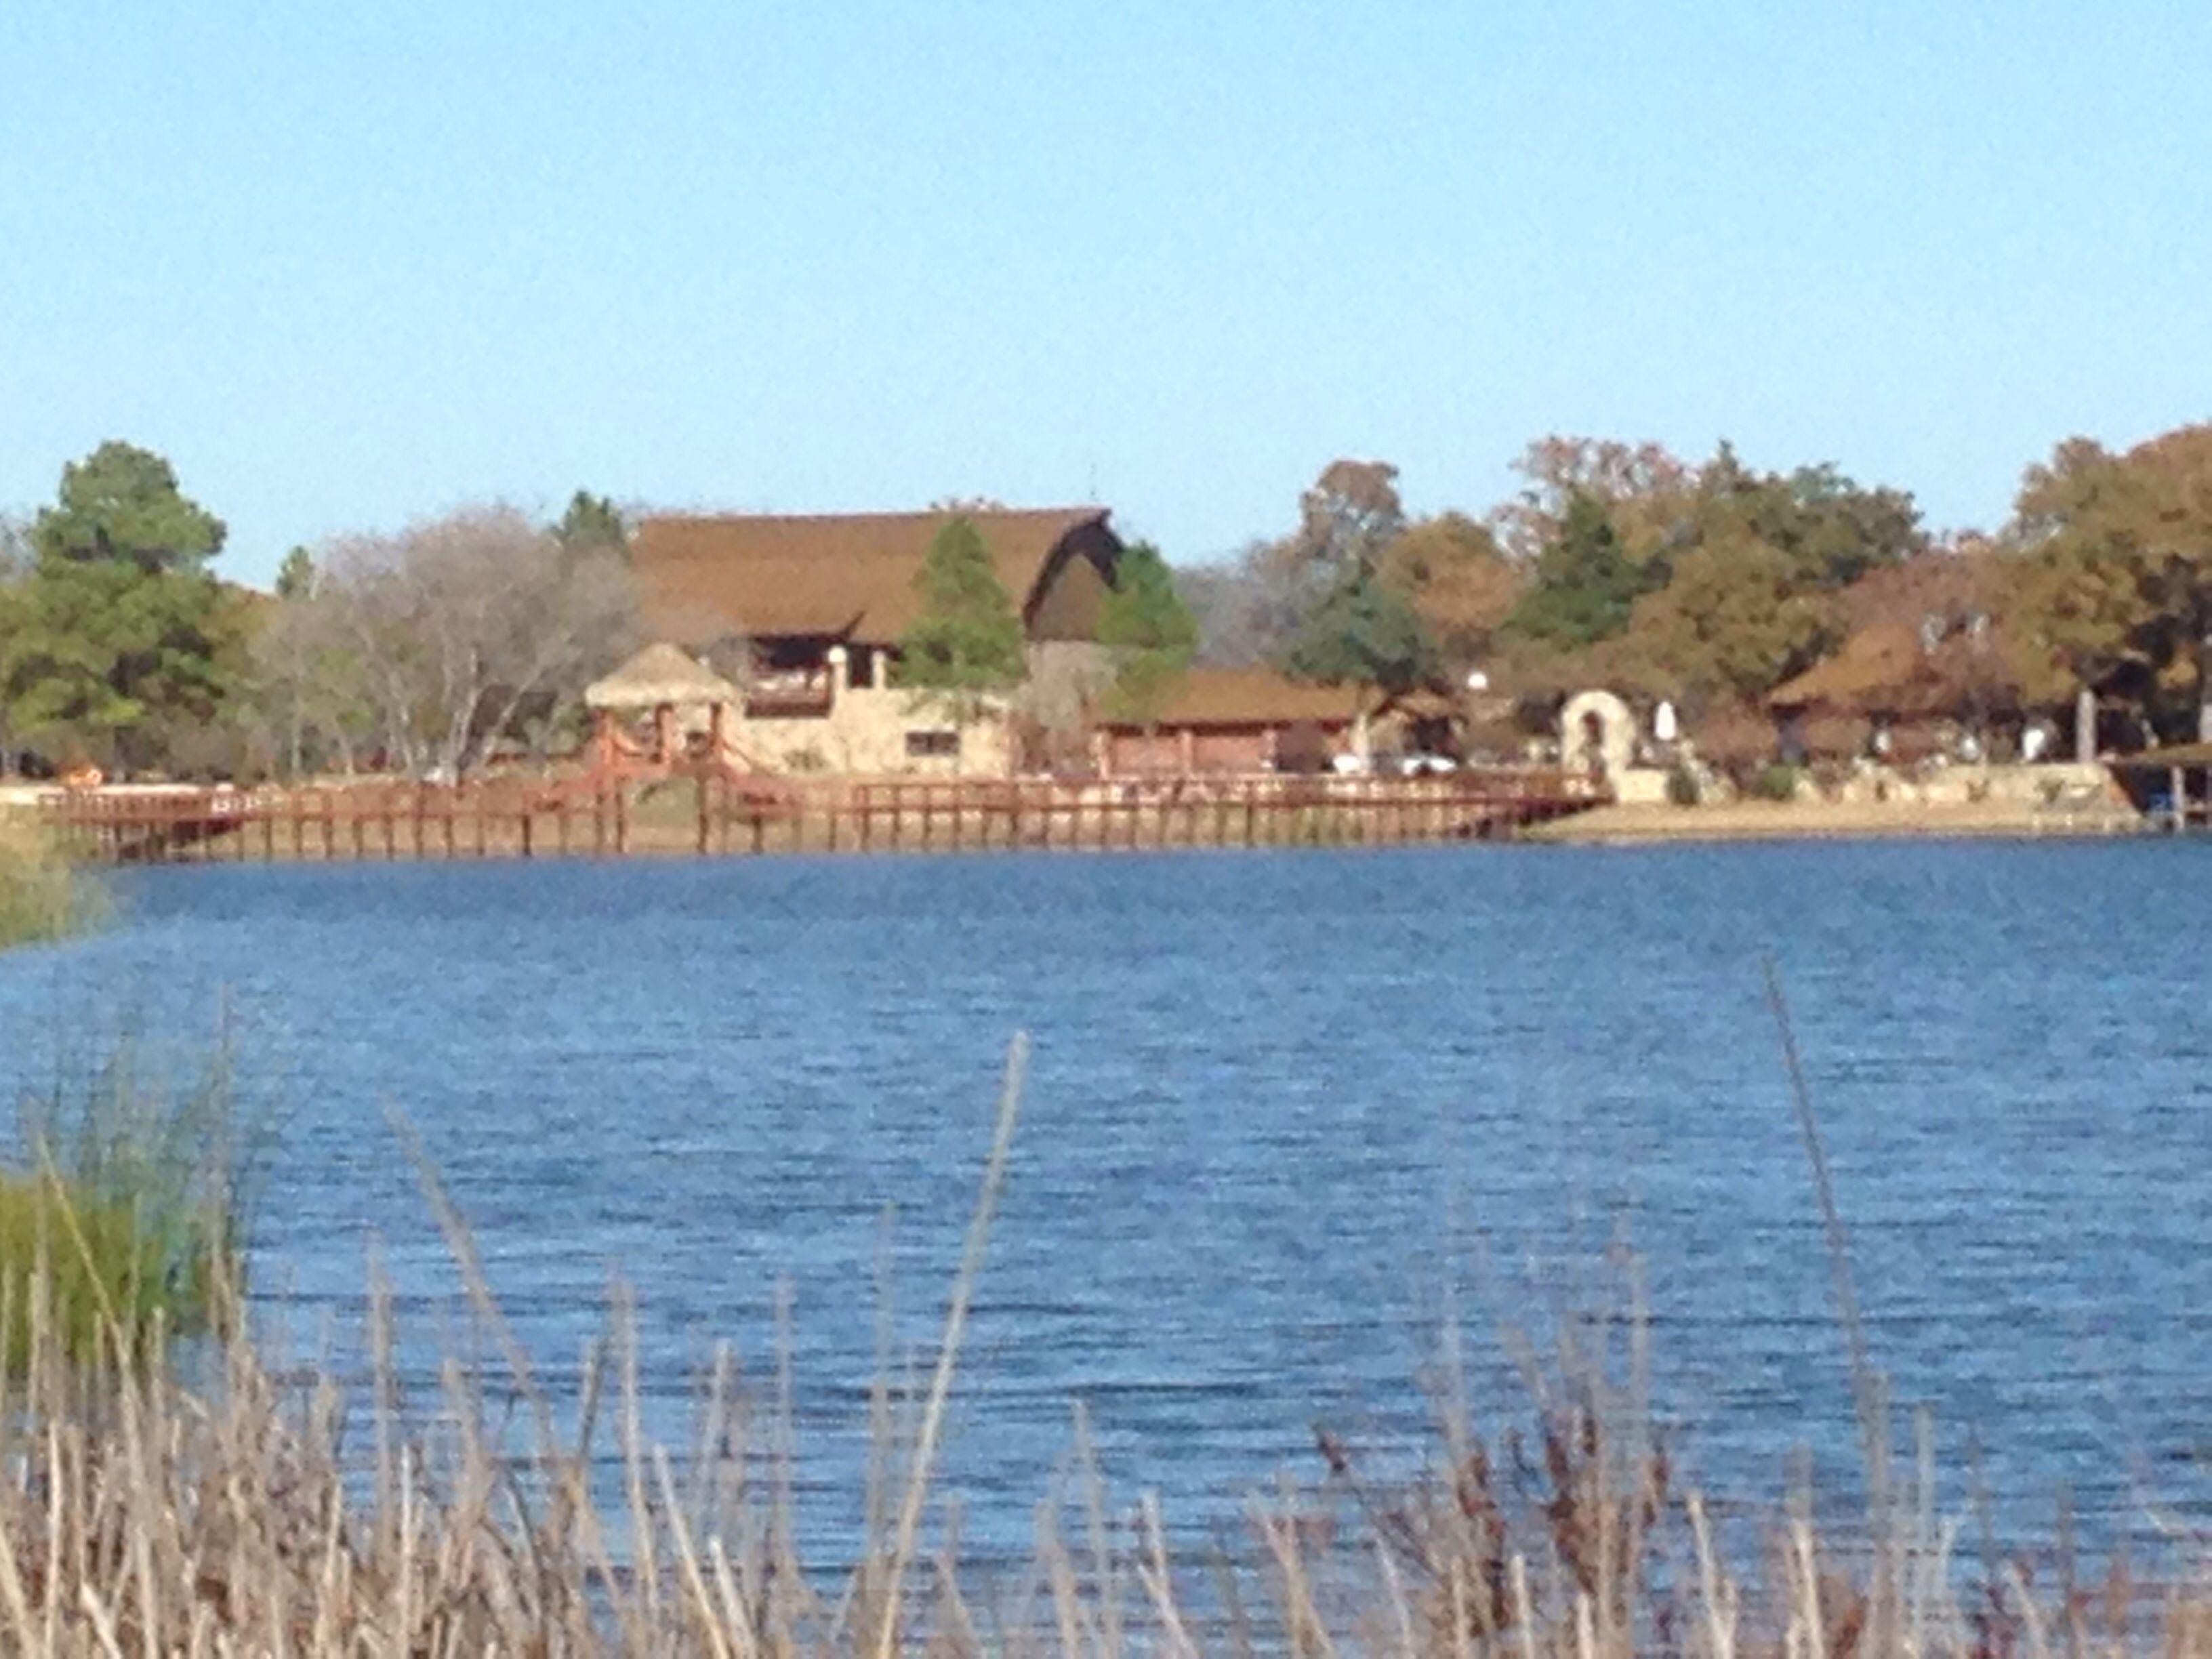 cabins real between estate pricemax tulsa lake listings pricemin tenkiller ok custom search